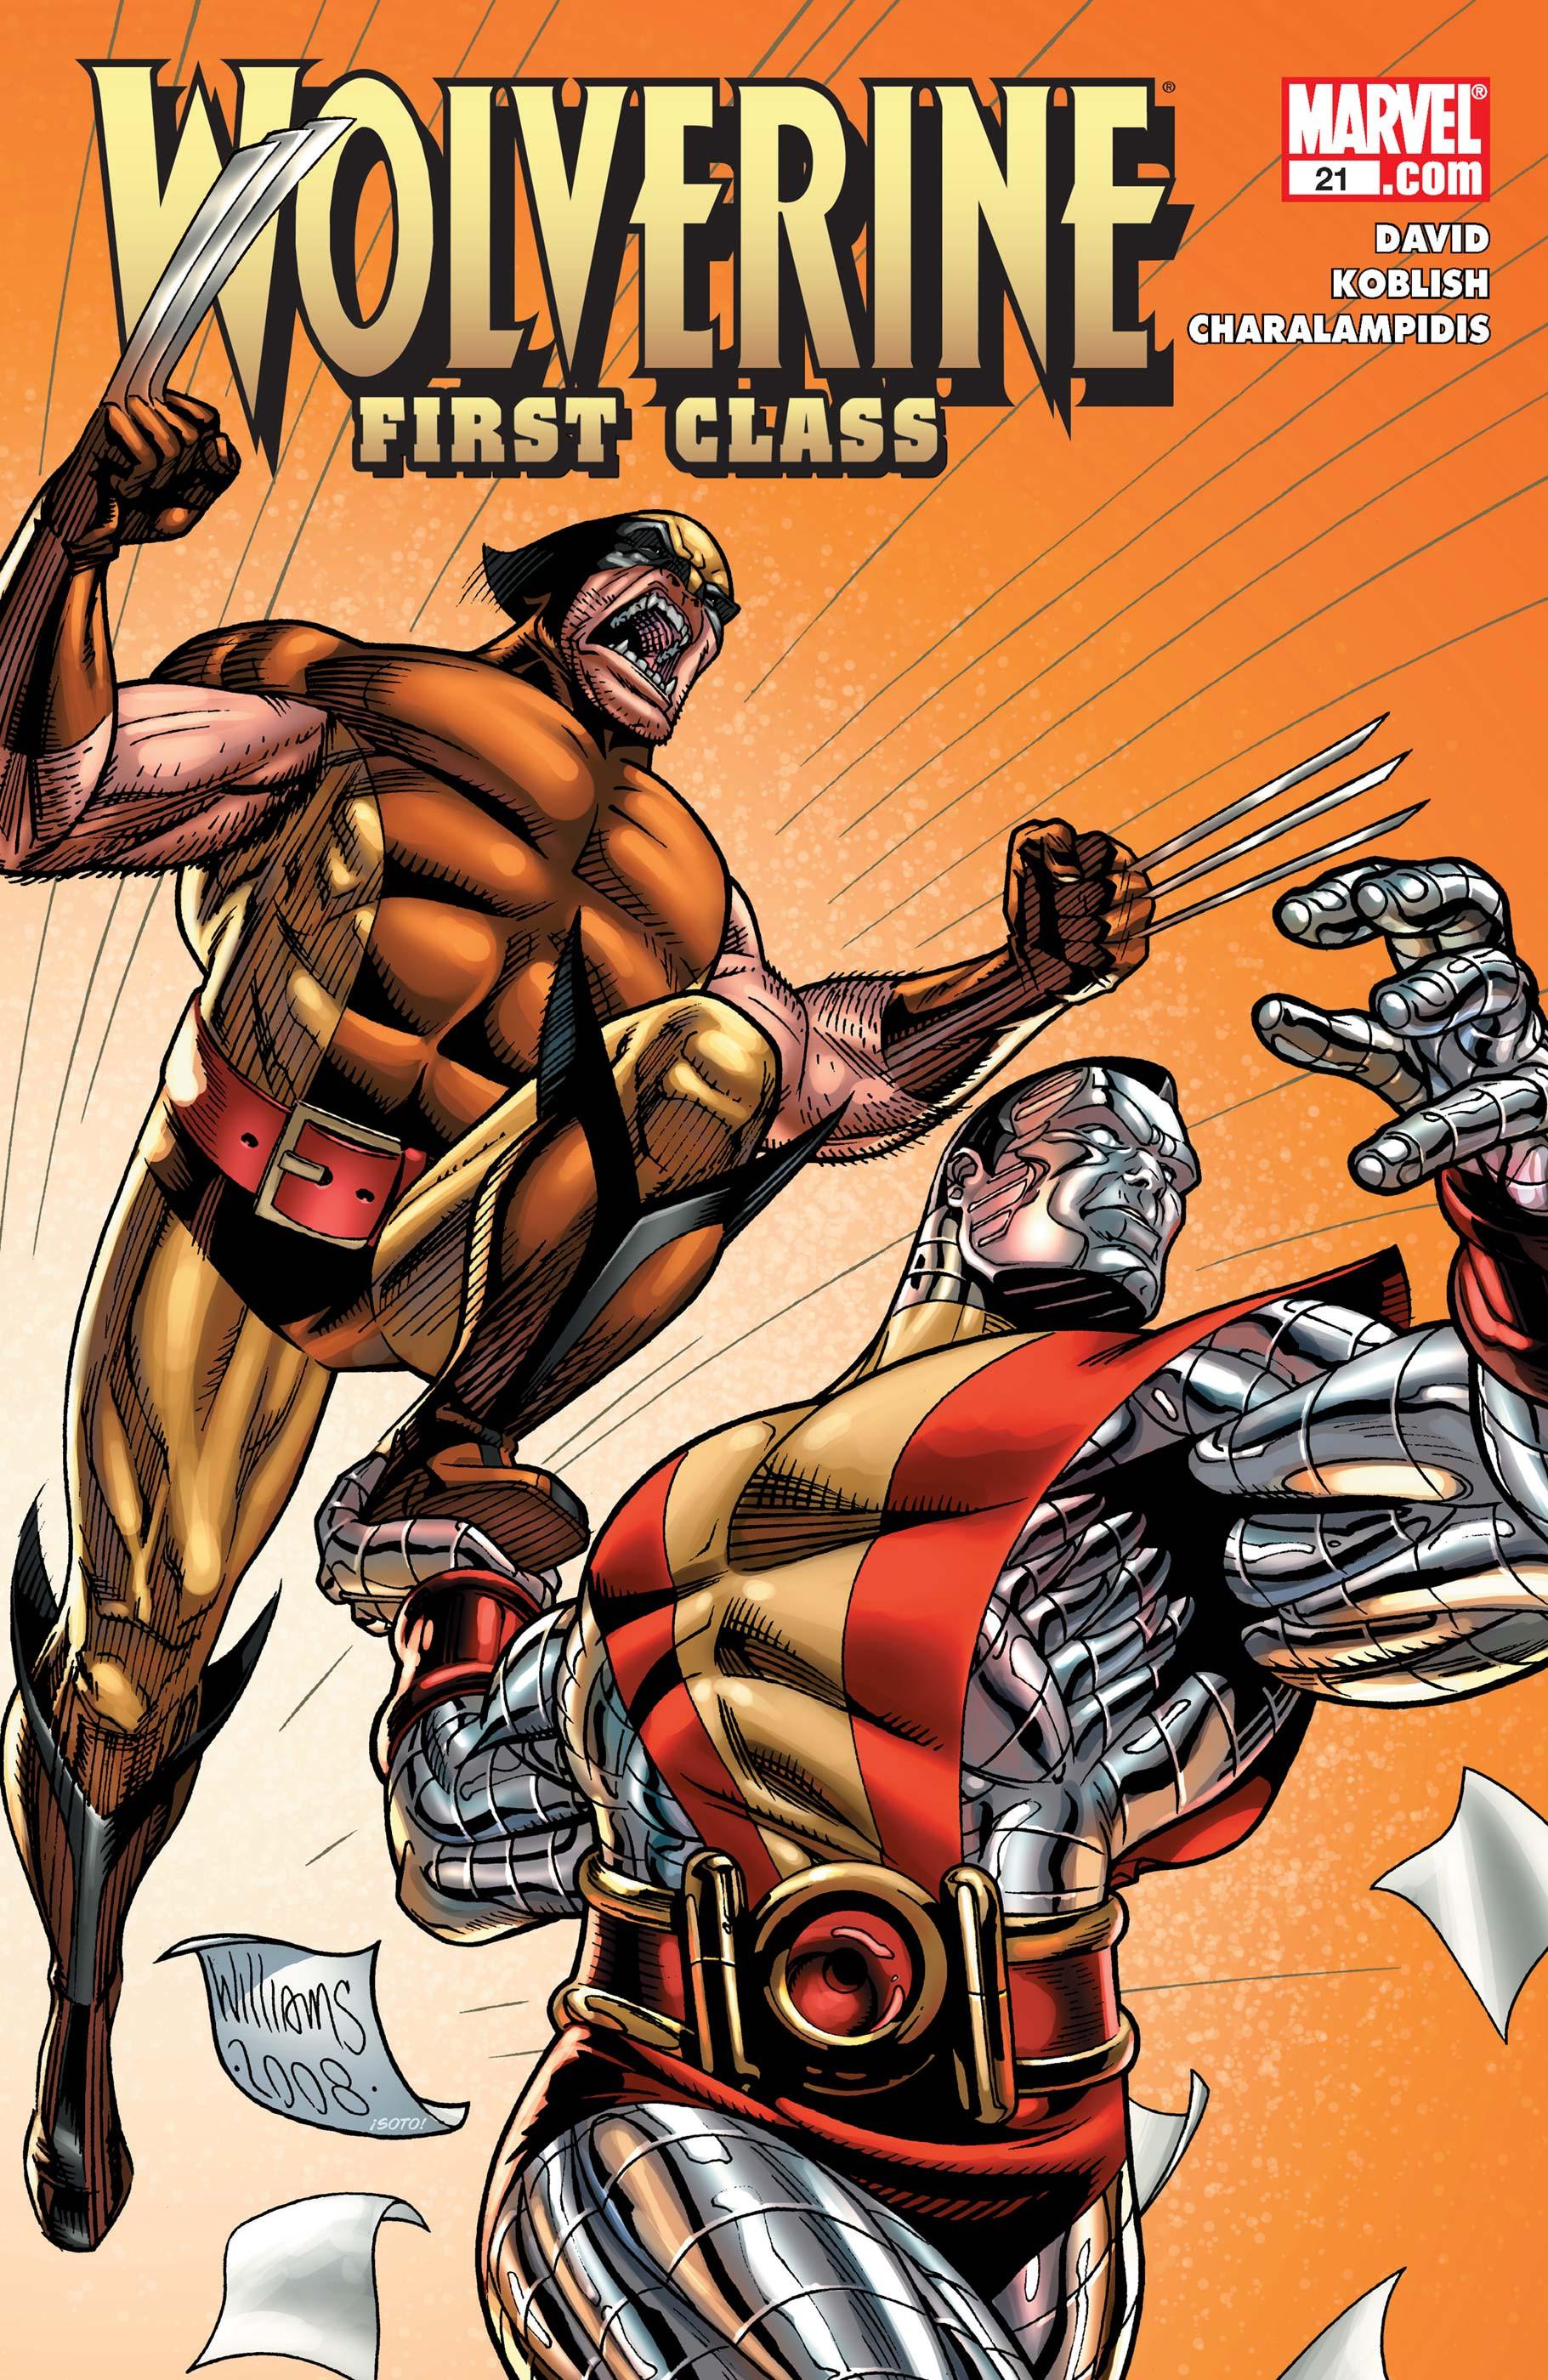 Wolverine First Class Vol 1 21